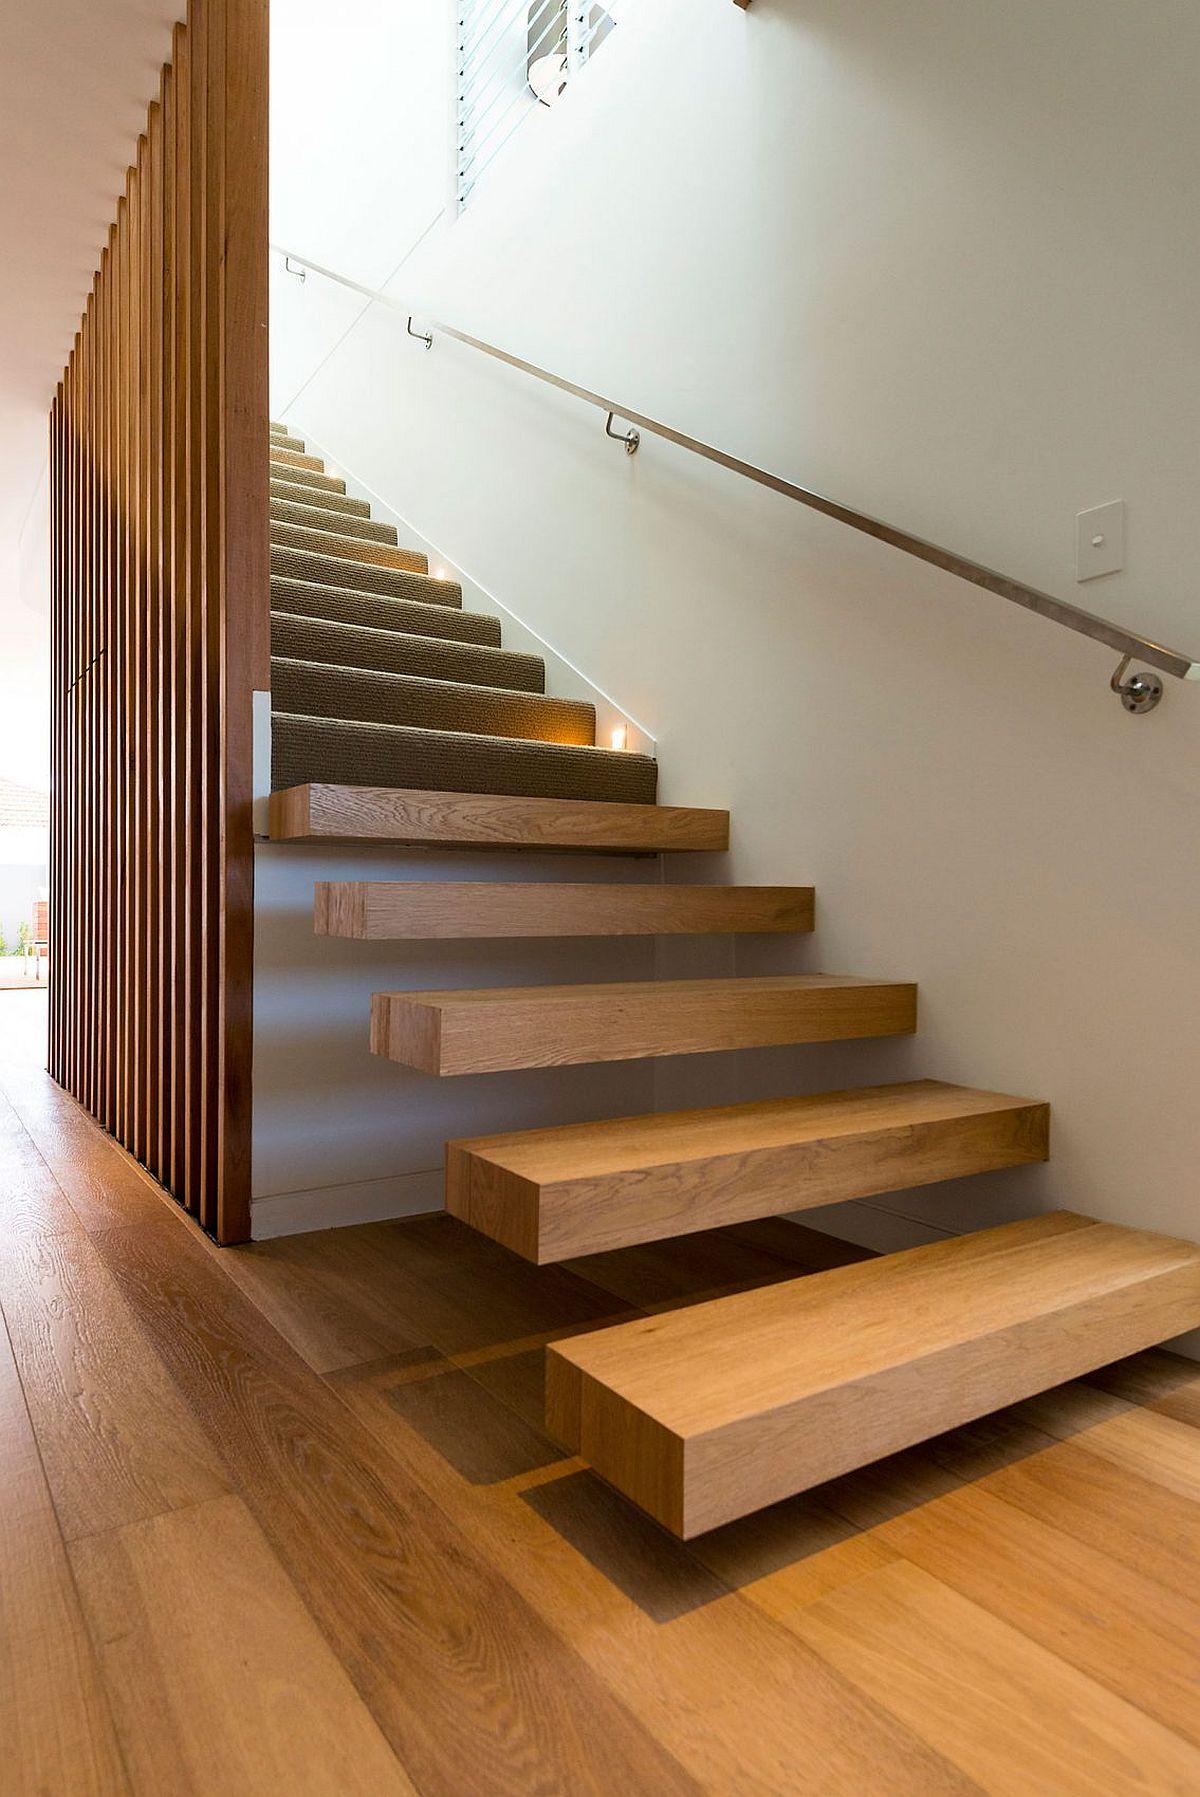 Single Level 60s Sydney Home Gets a Beachy Modern Upgrade